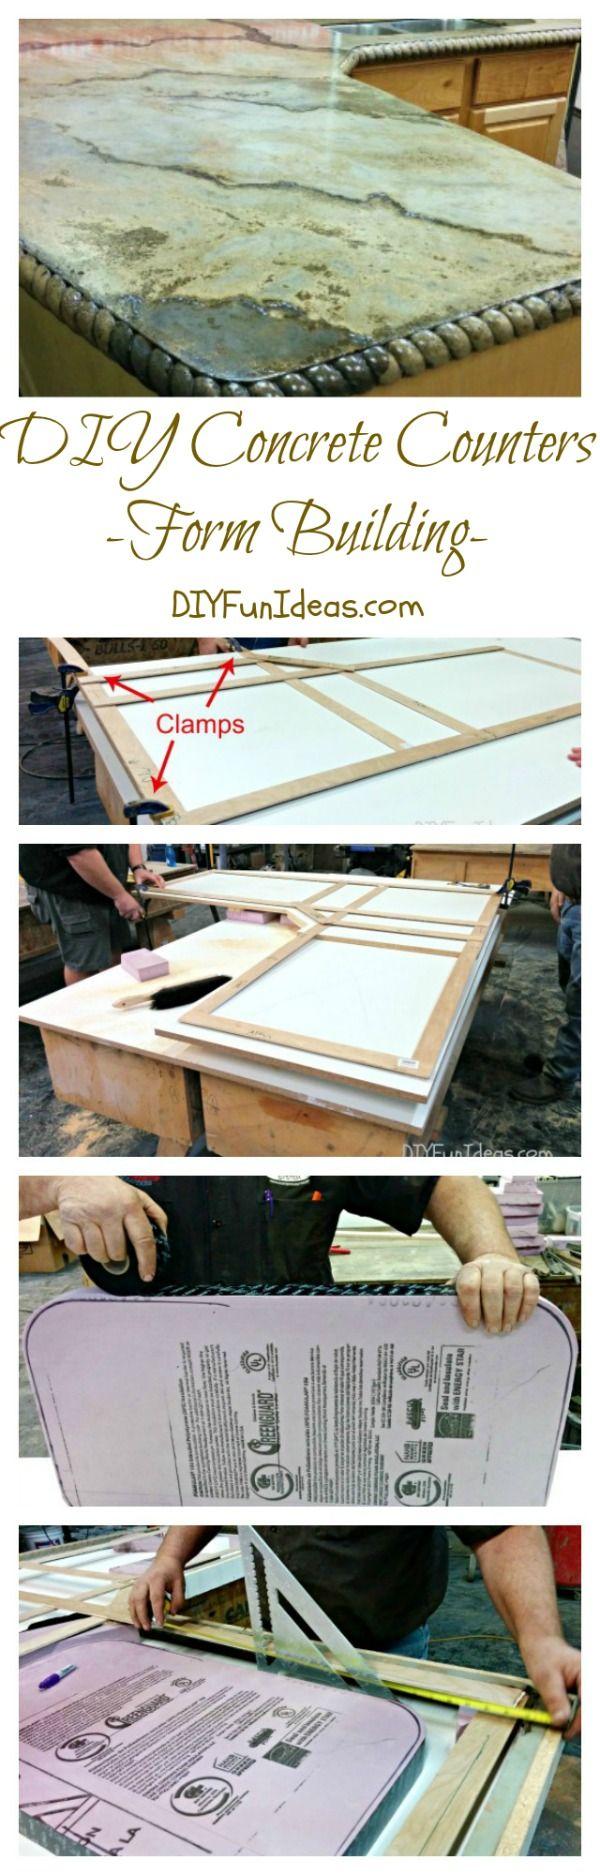 DIY CONCRETE COUNTERS - FORM BUILDING